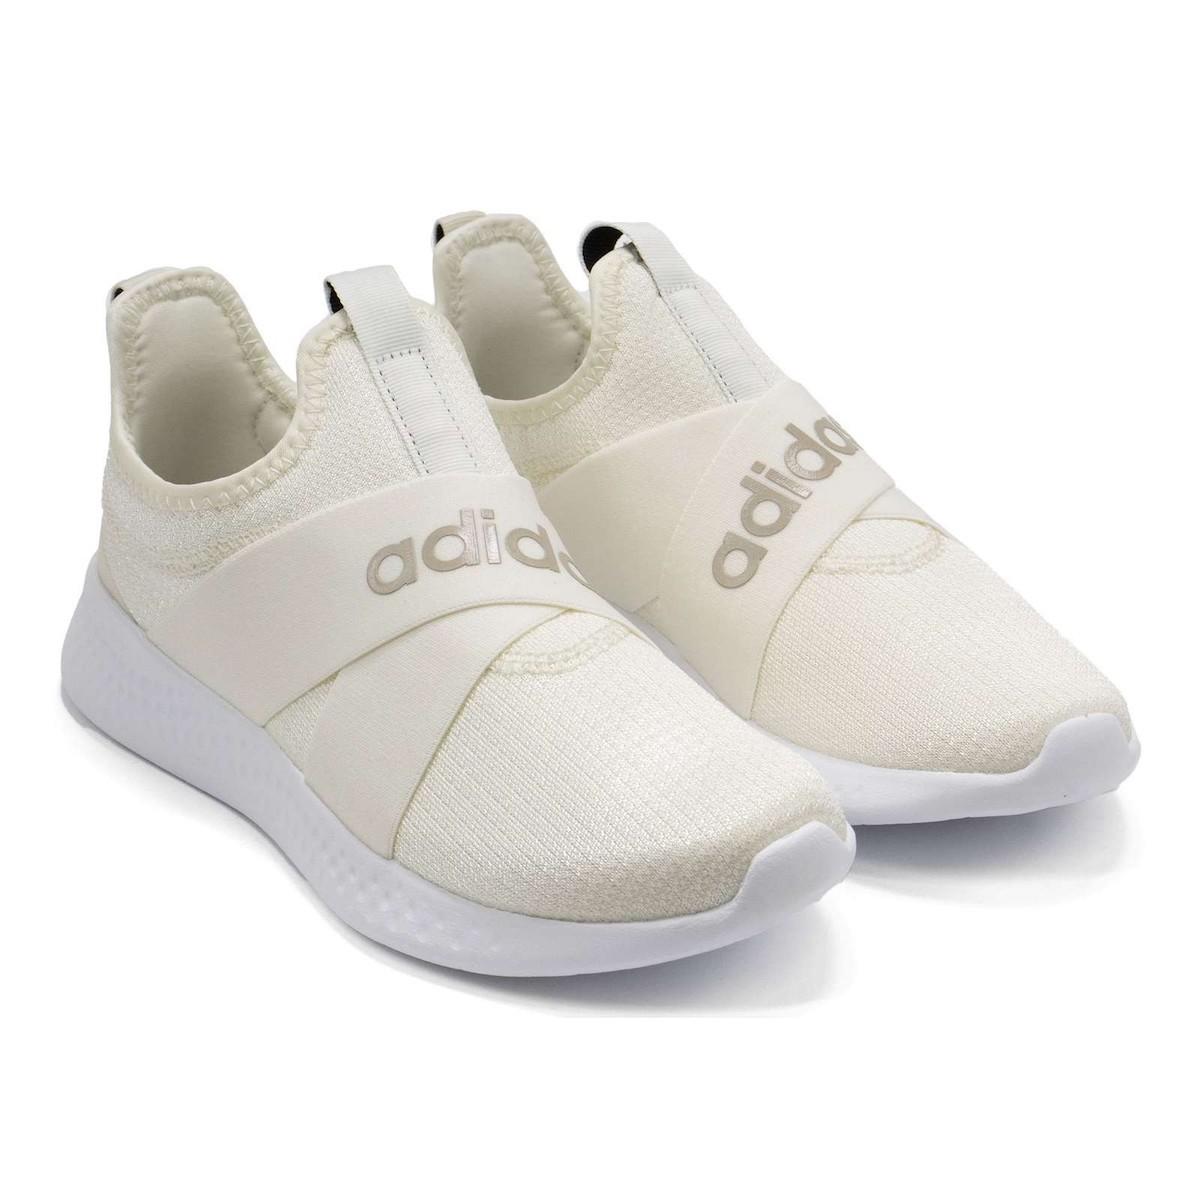 Adidas Women's Puremotion Adapt